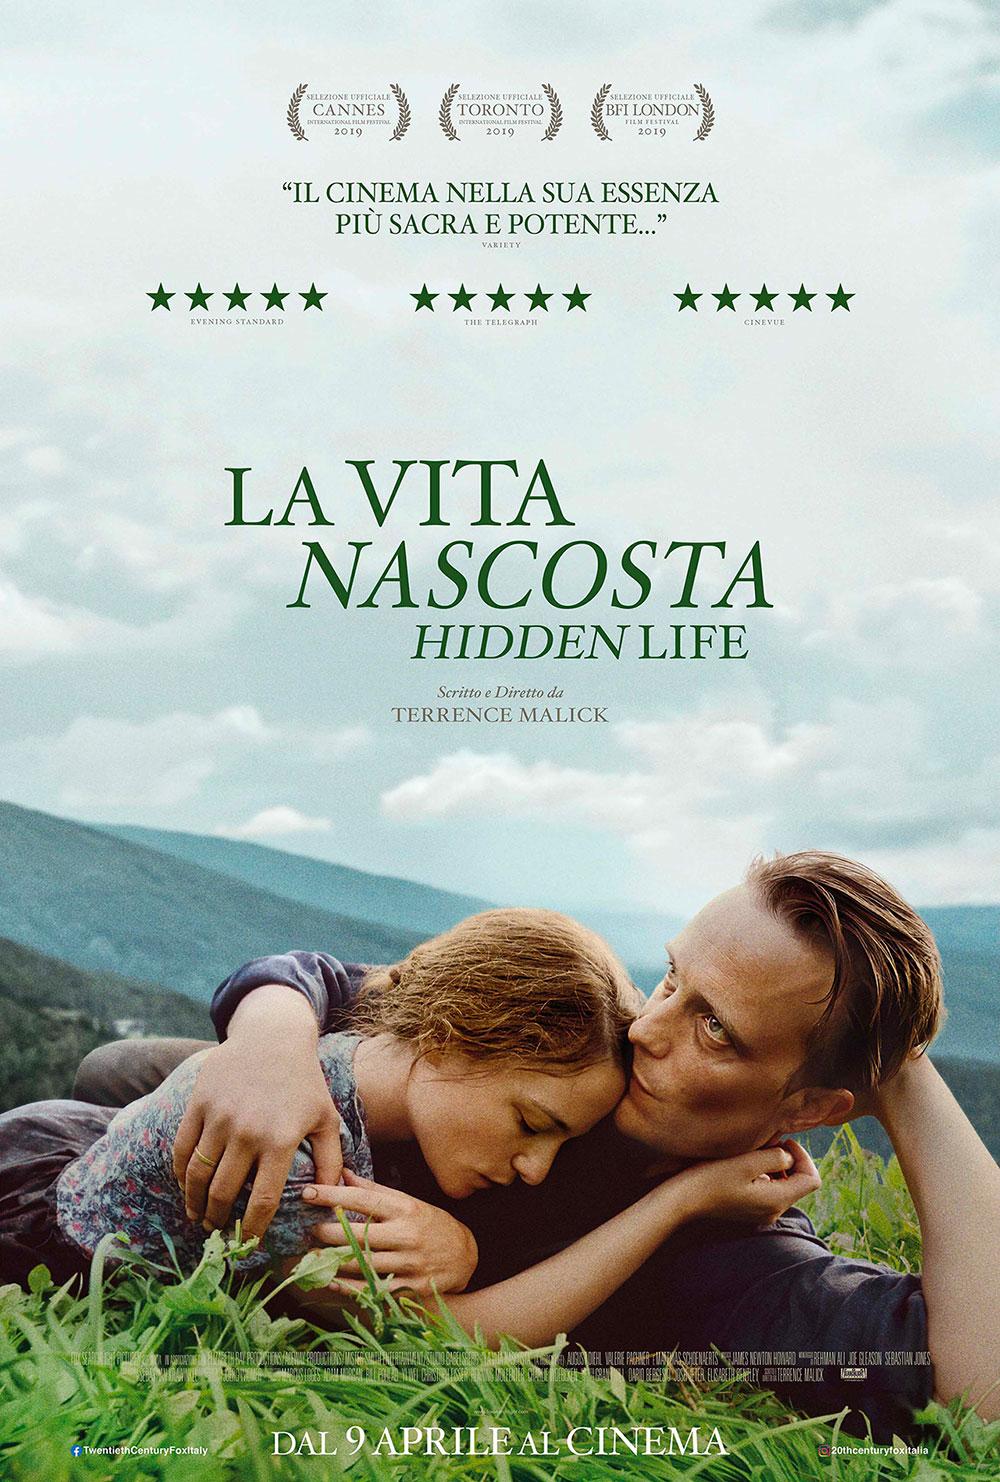 ANTONIANO CINEMA